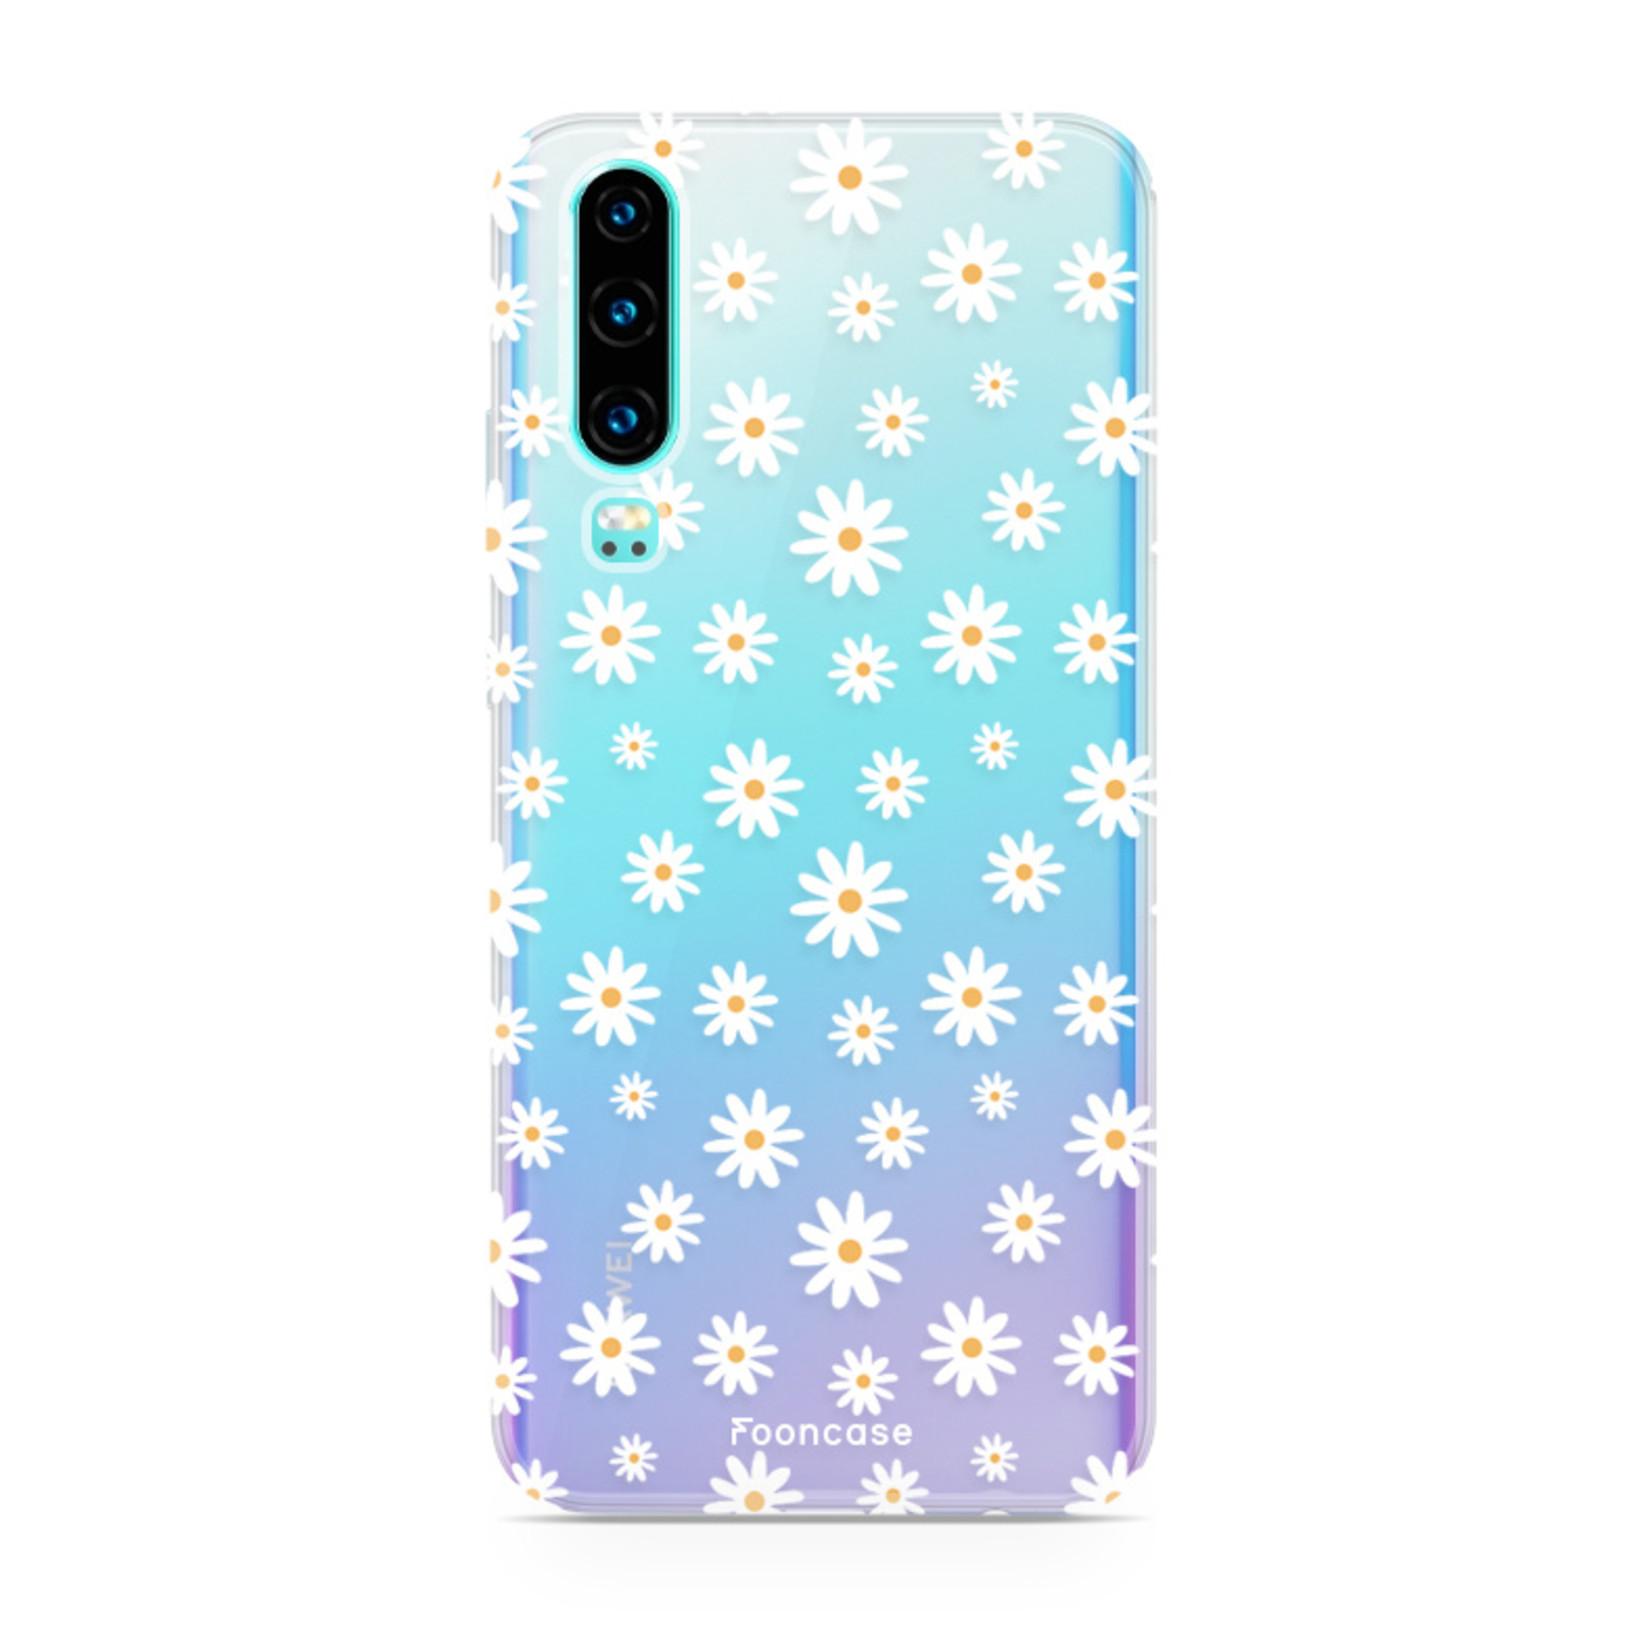 FOONCASE Huawei P30 Handyhülle - Gänseblümchen